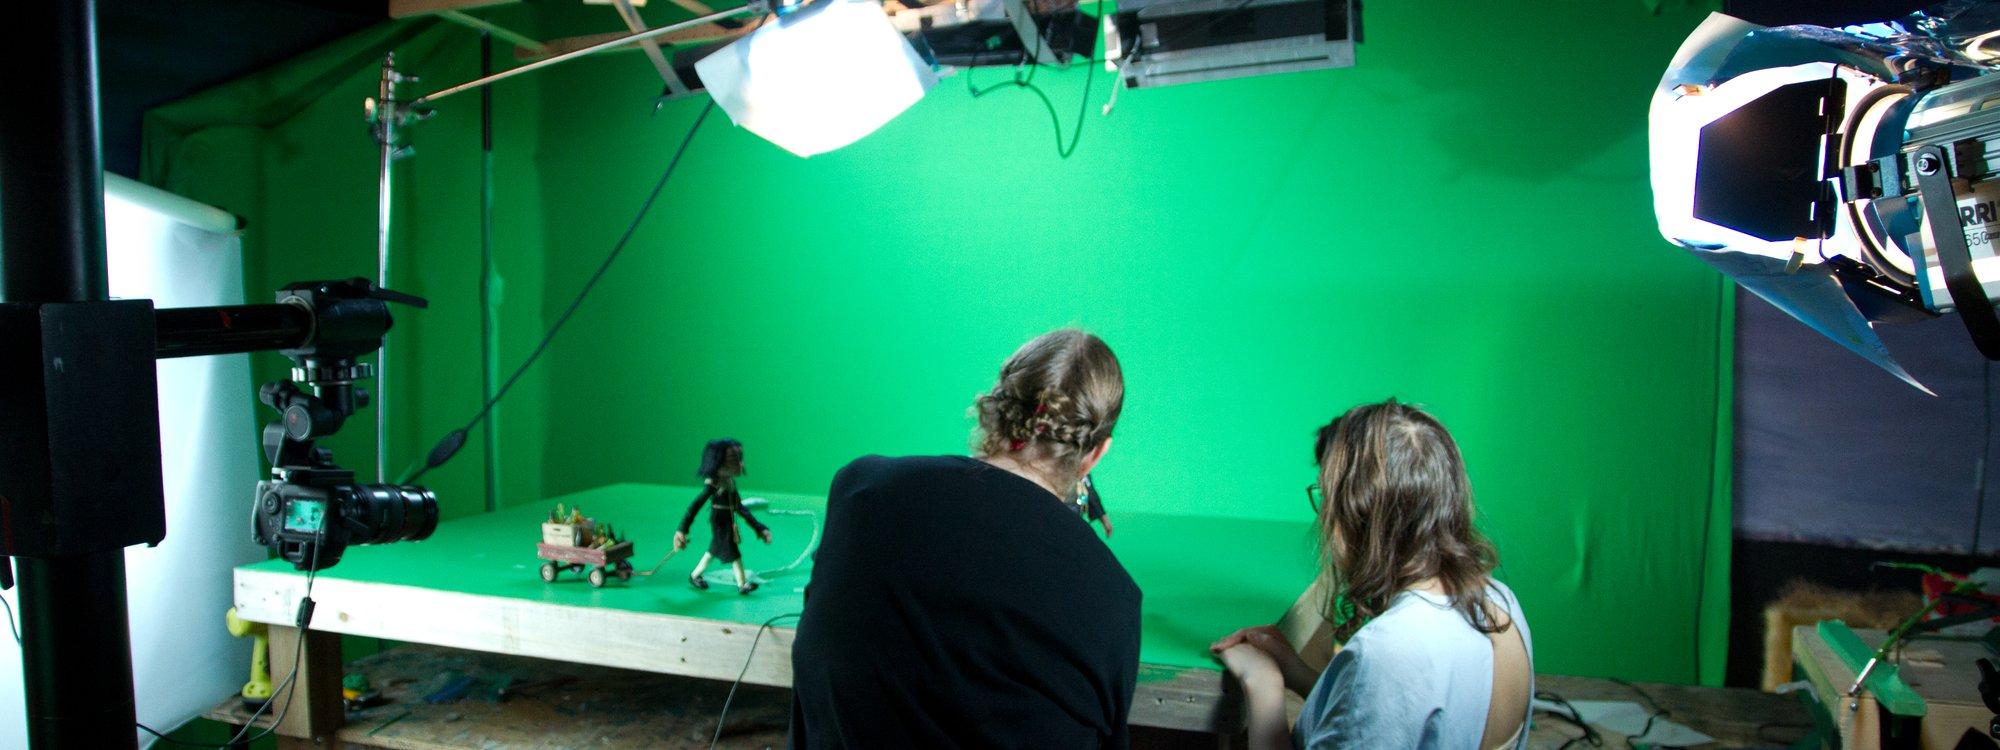 Animators prepping for the next frame of FFOTM.